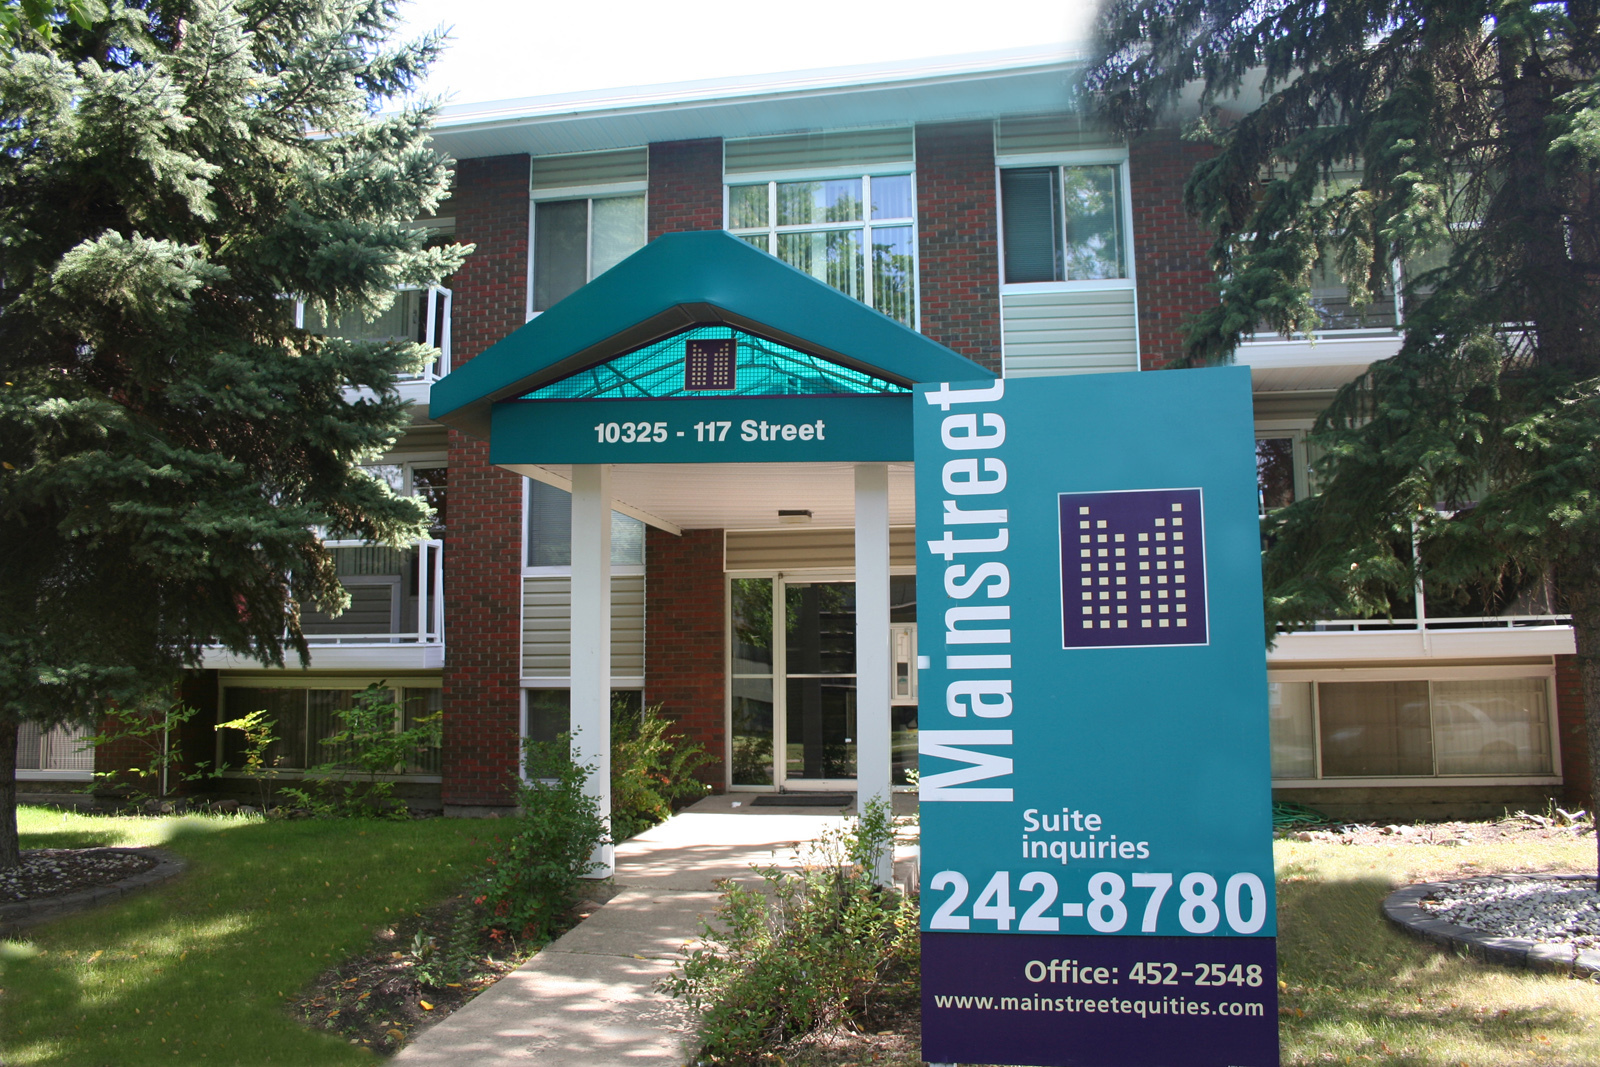 10325 117 Street NW, Edmonton, AB - $1,185 CAD/ month